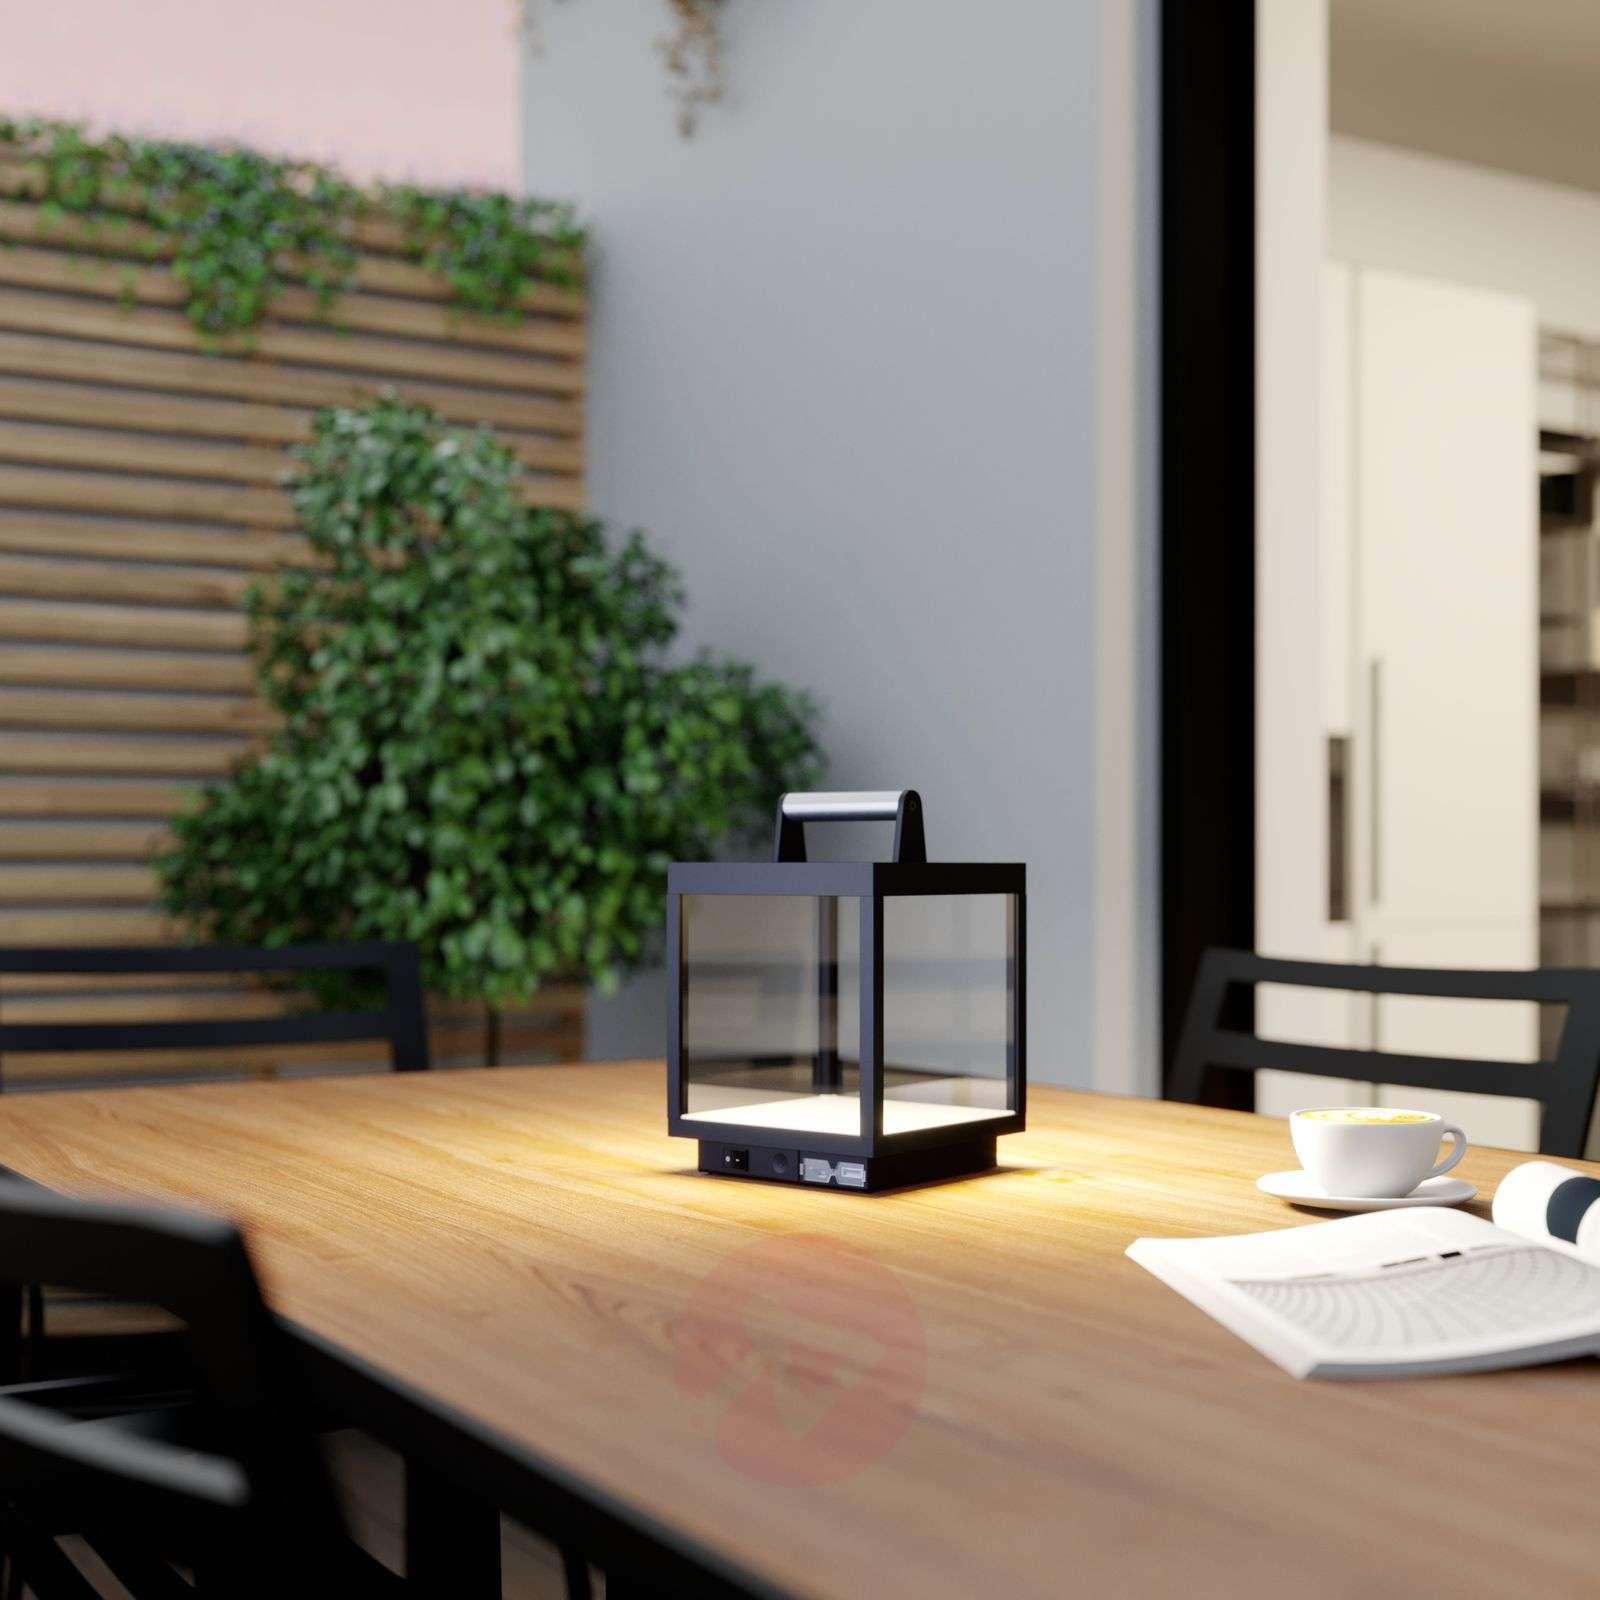 LED-pöytävalaisin Cube ulos, ladattava-9619161-03